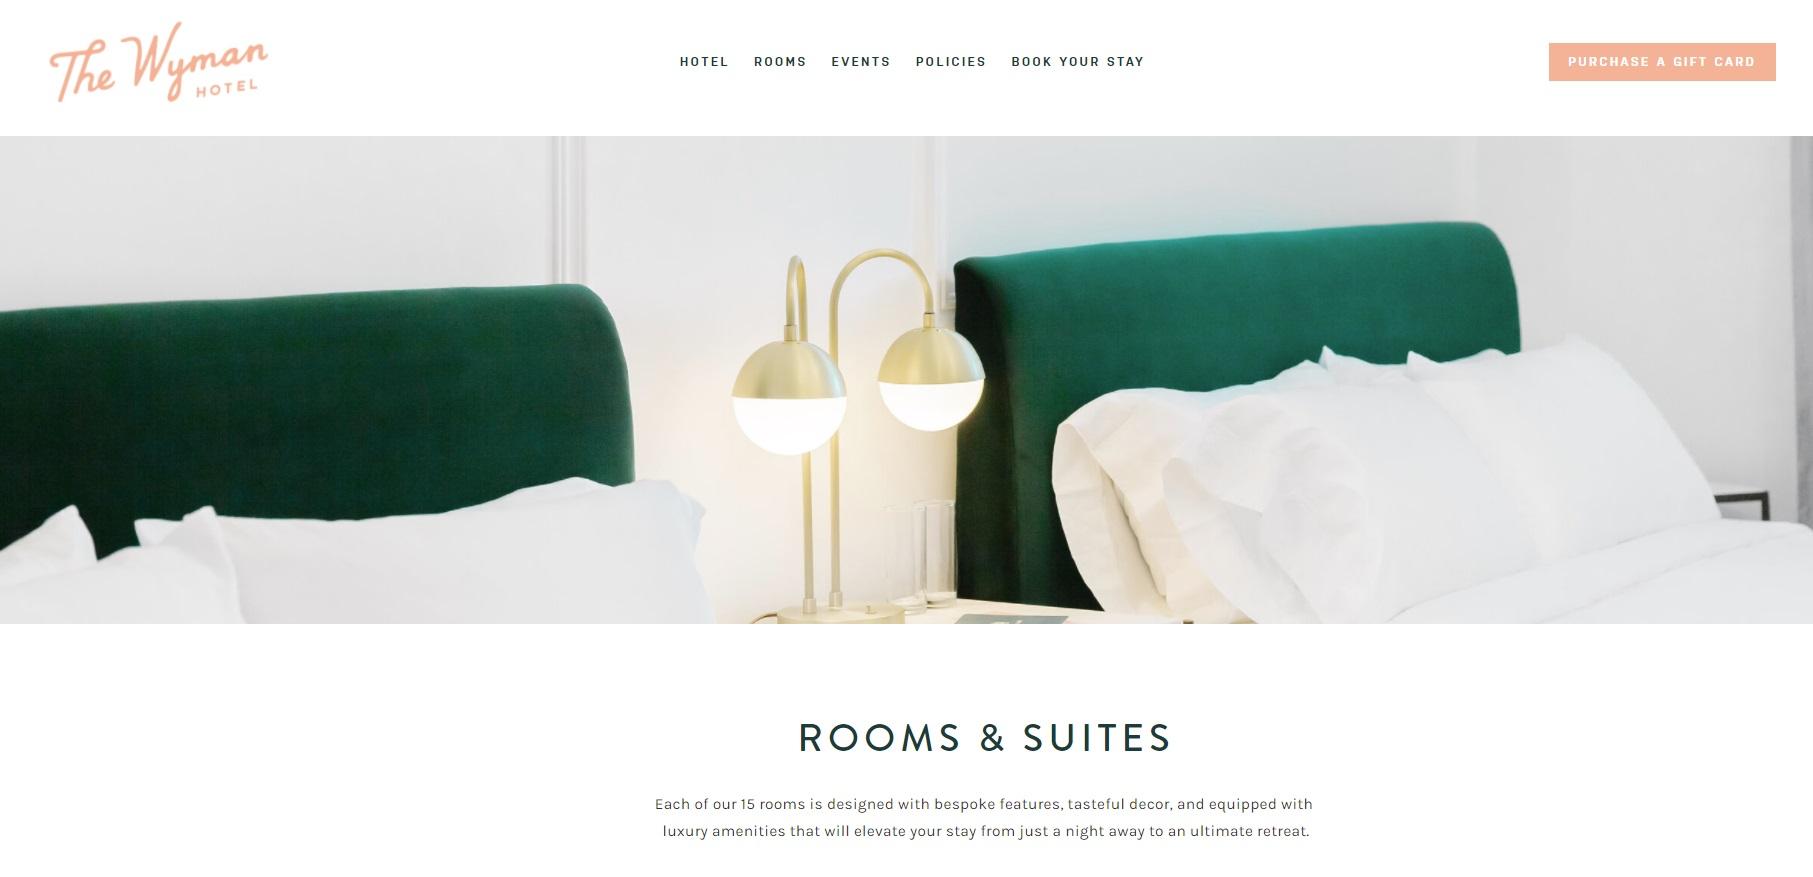 05_Wyman hotel website screenshot